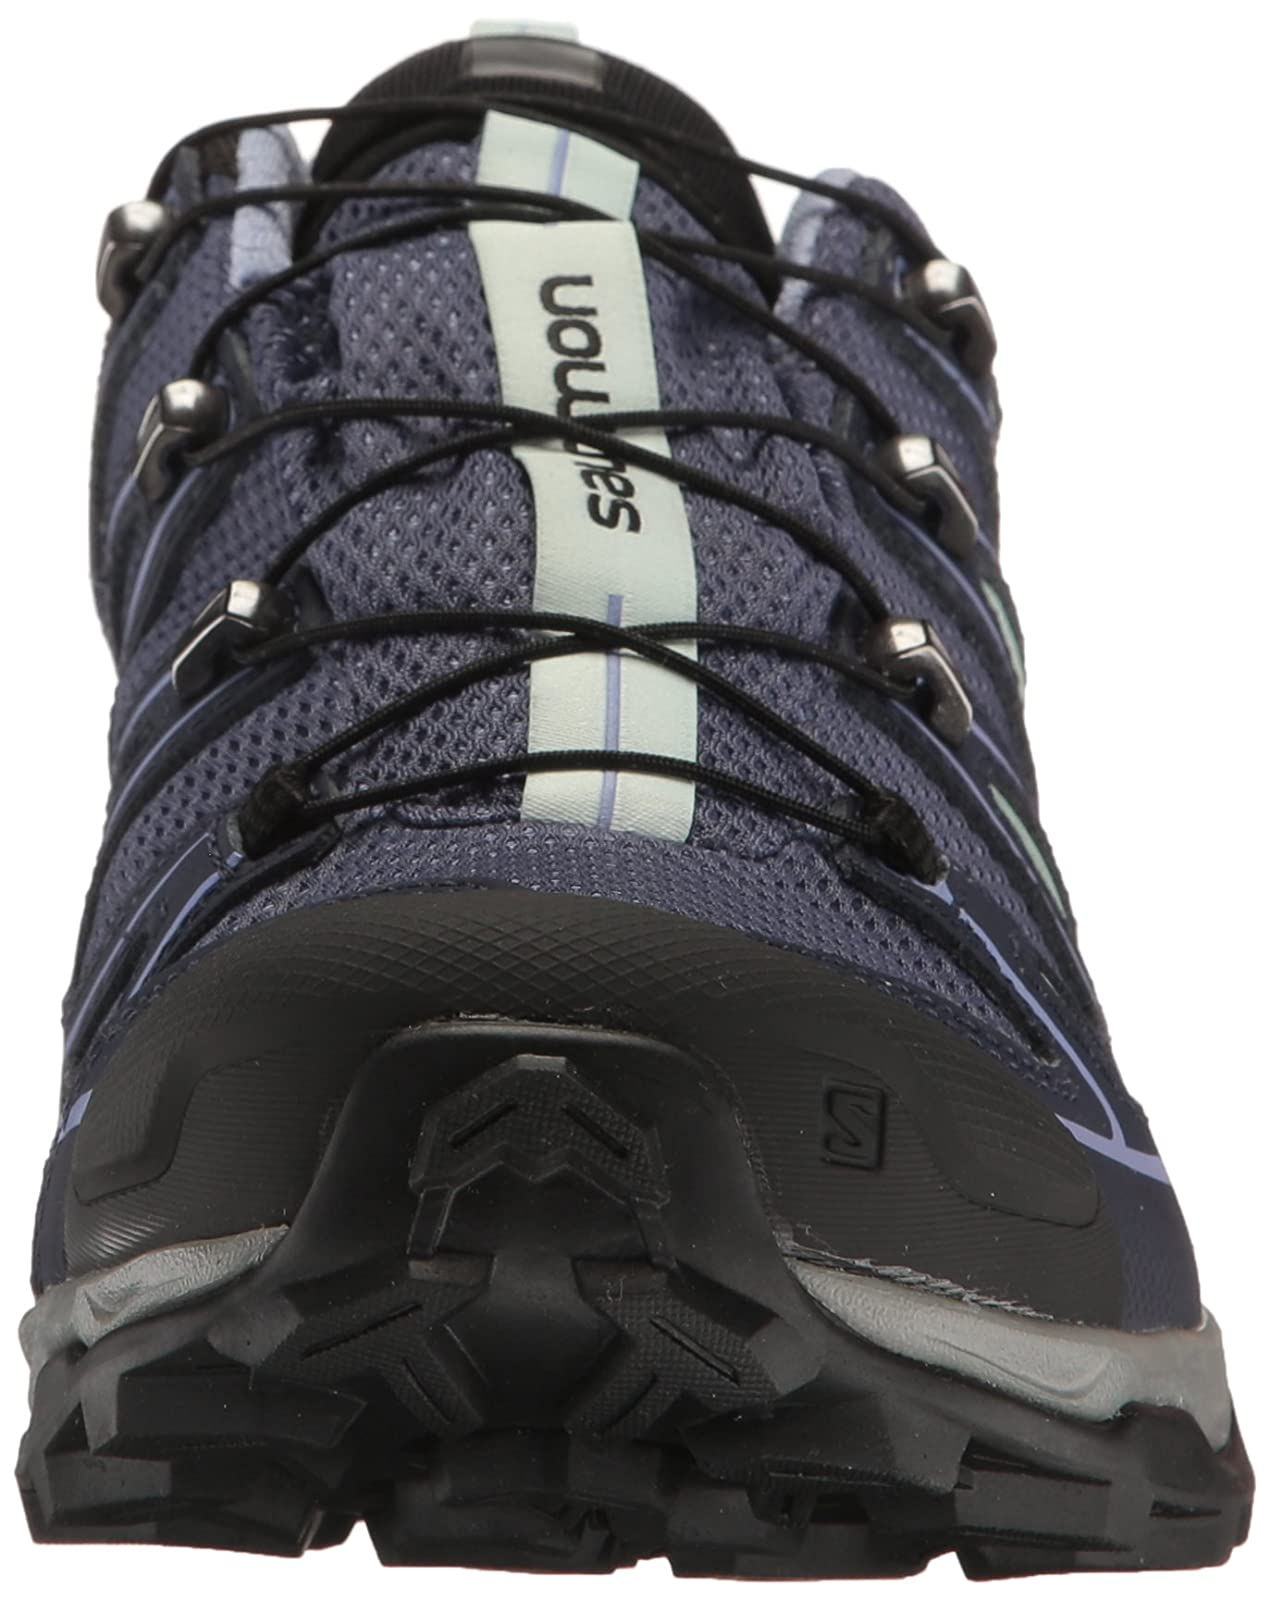 Salomon Women's X Ultra 2 GTX W Hiking Shoe 7 M US - 4